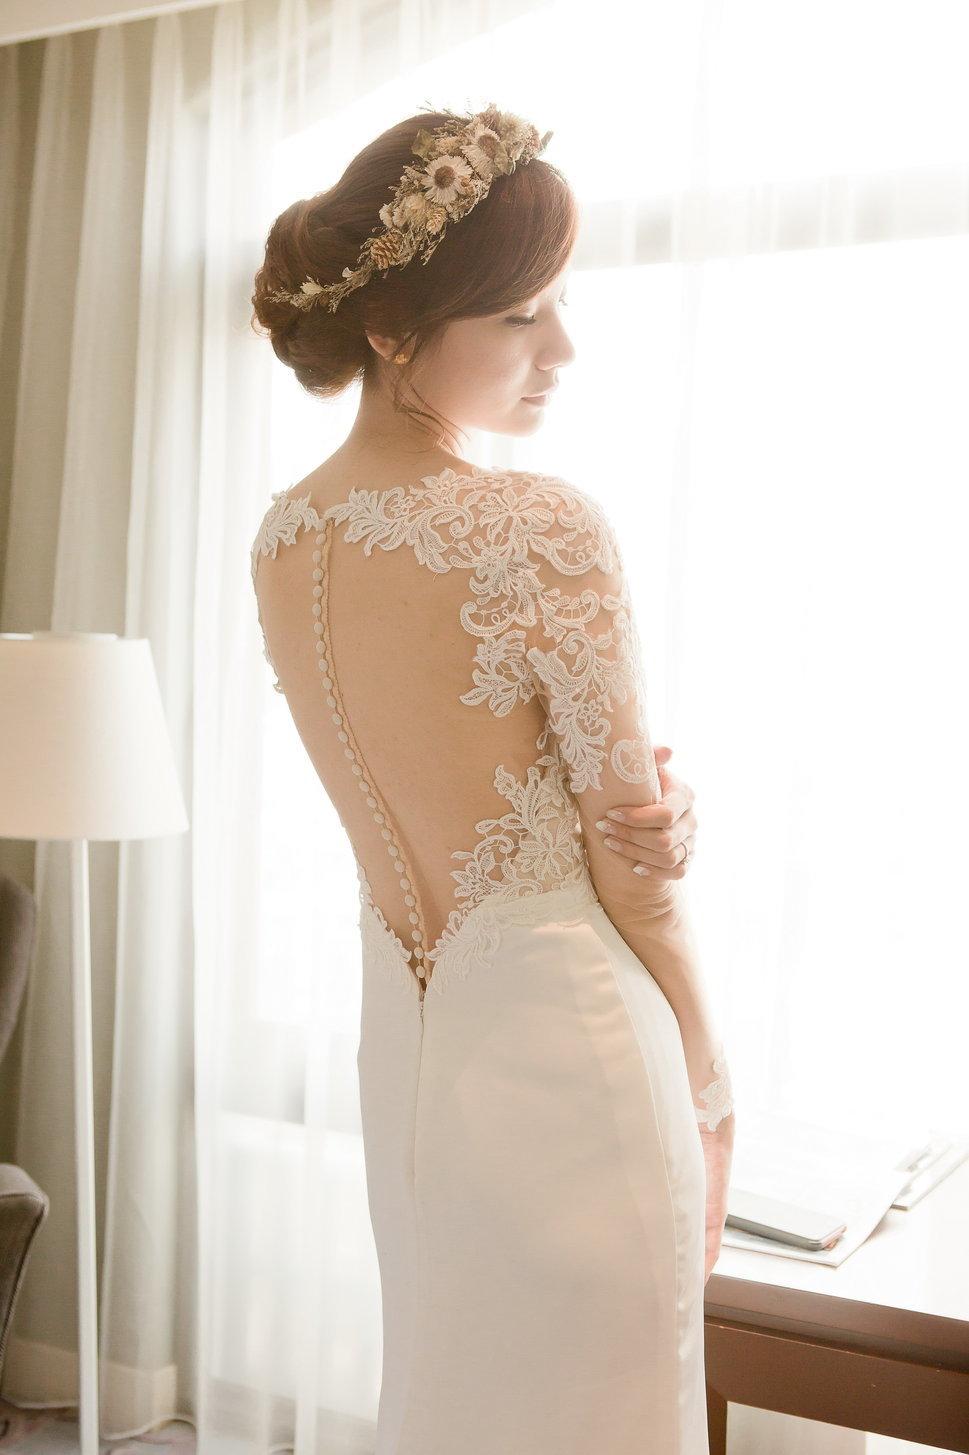 EDEN 女婚攝 作品(編號:431732) - Eden婚禮紀錄 - 結婚吧一站式婚禮服務平台